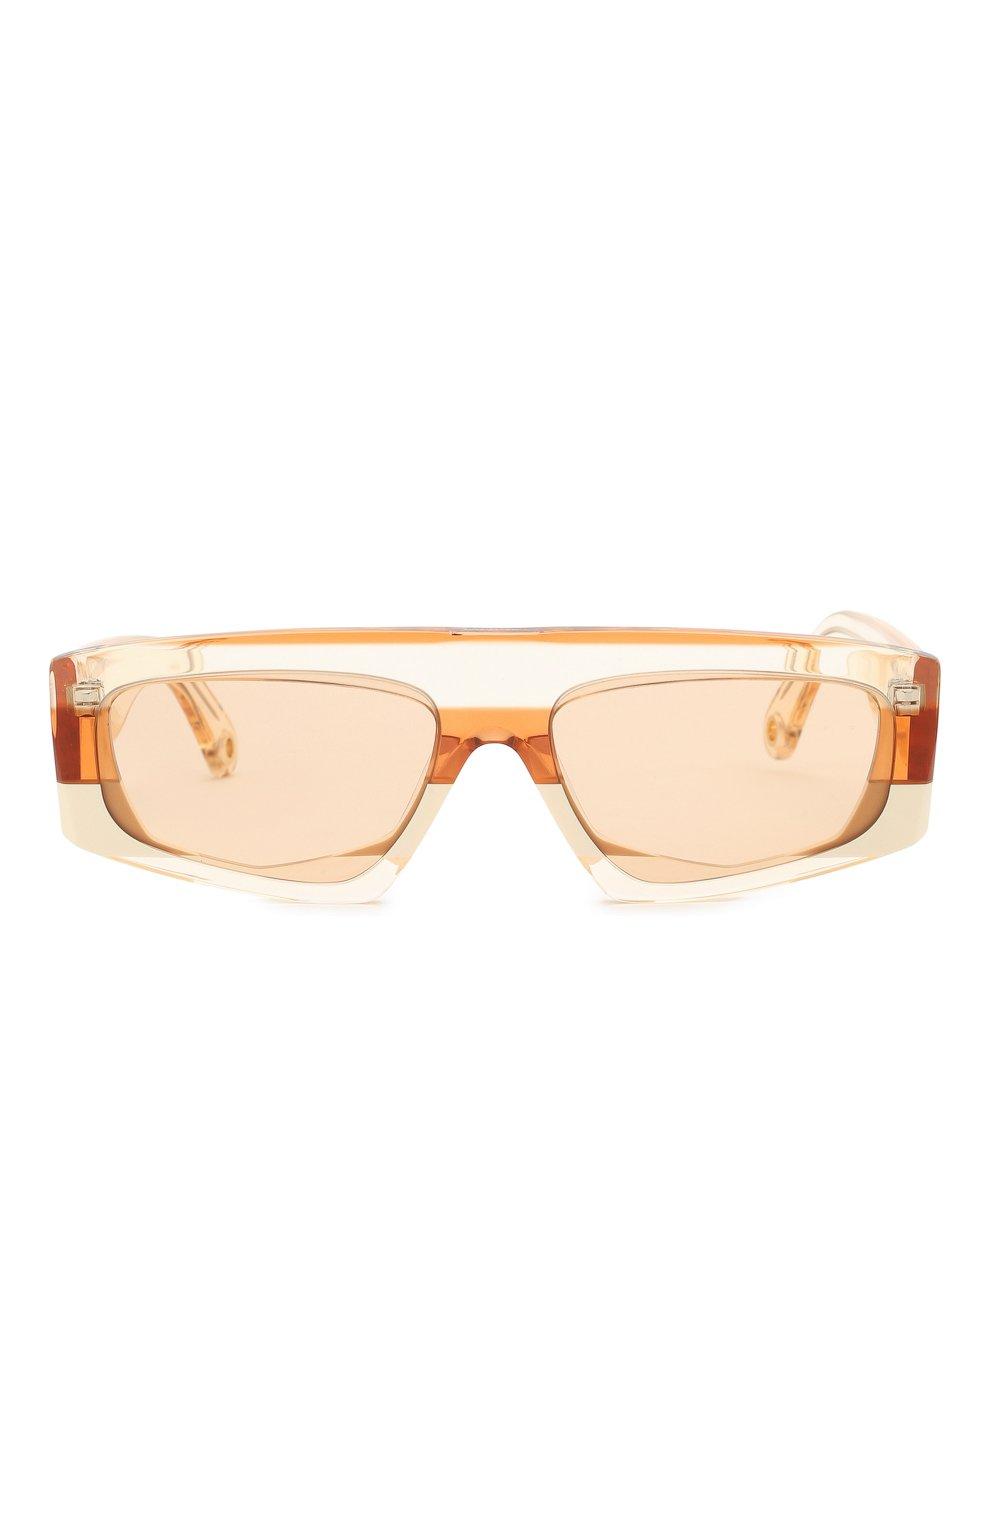 Женские солнцезащитные очки JACQUEMUS оранжевого цвета, арт. LES LUNETTES YAUC0 SHADE 0F 0RANGE | Фото 4